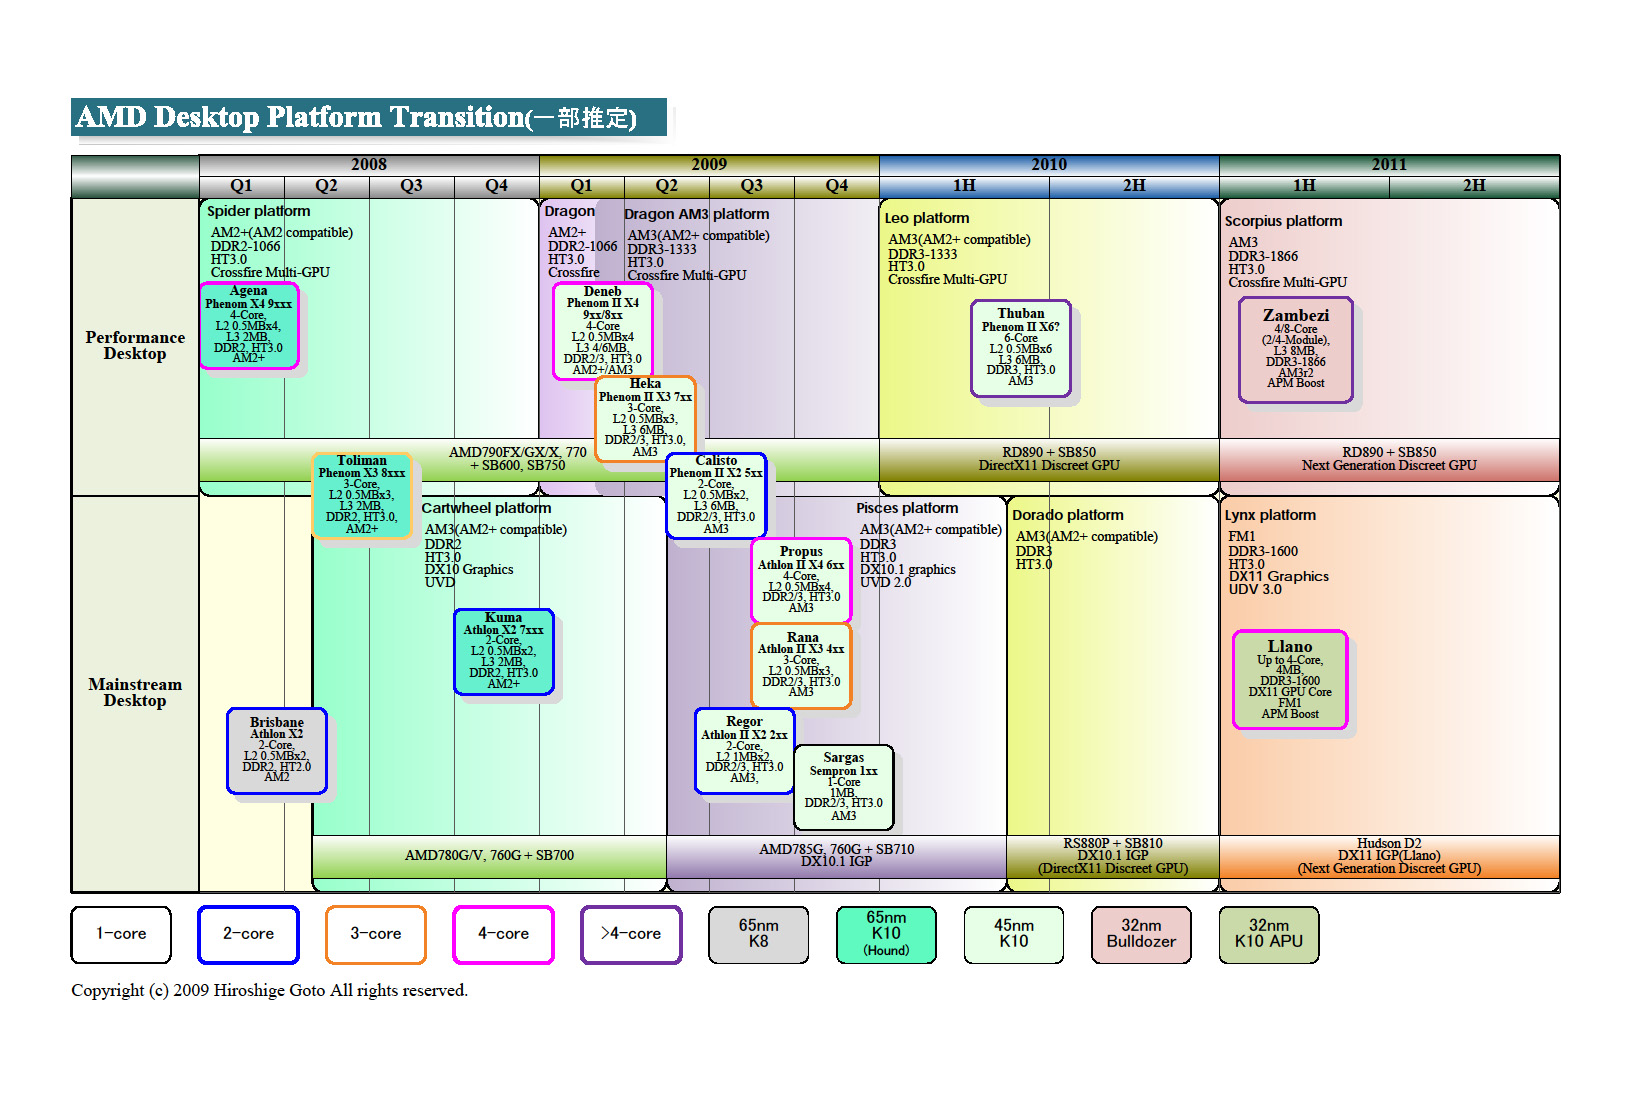 "<div align=""center"">AMDのデスクトップCPU移行図           <br>         </div>         <div align=""center"">(PDFは<a href=""/video/pcw/docs/348/705/1.pdf"">こちら</a>)         </div>"